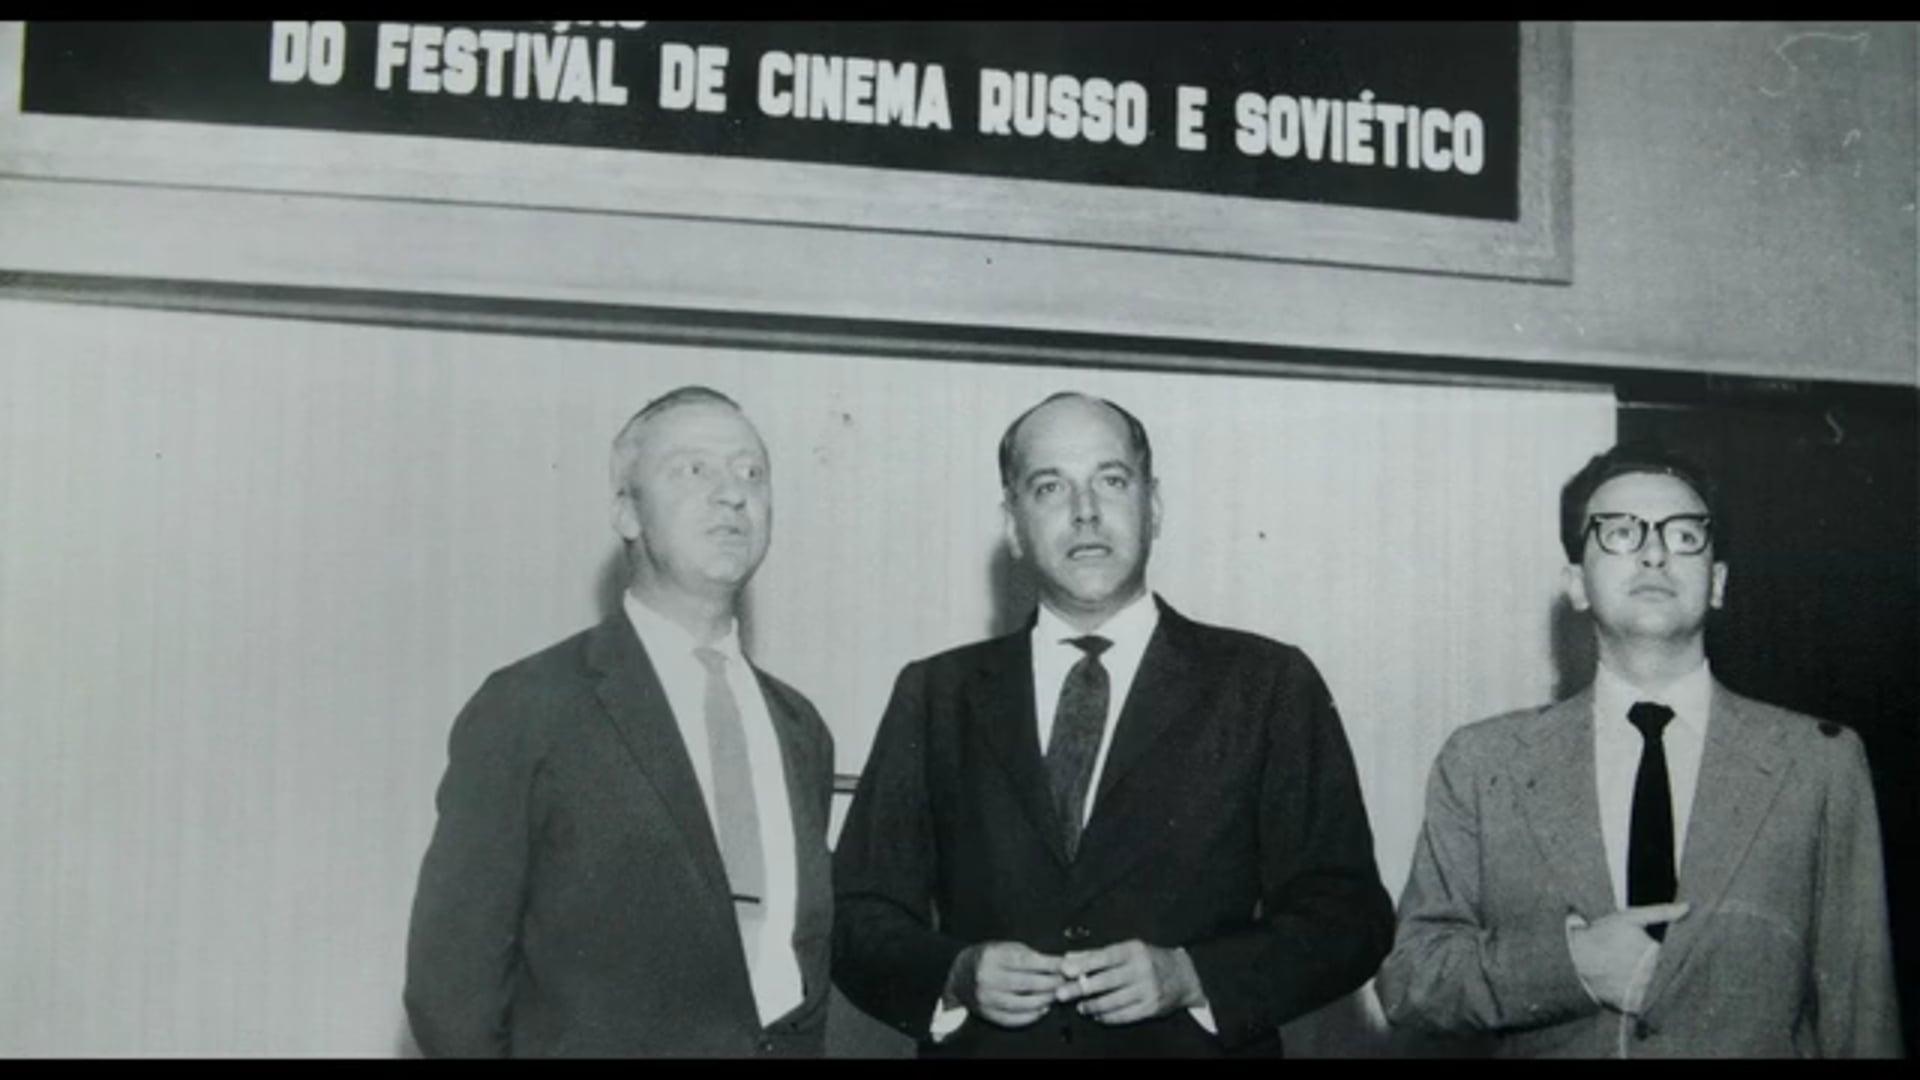 Escola de Cinema (2017)